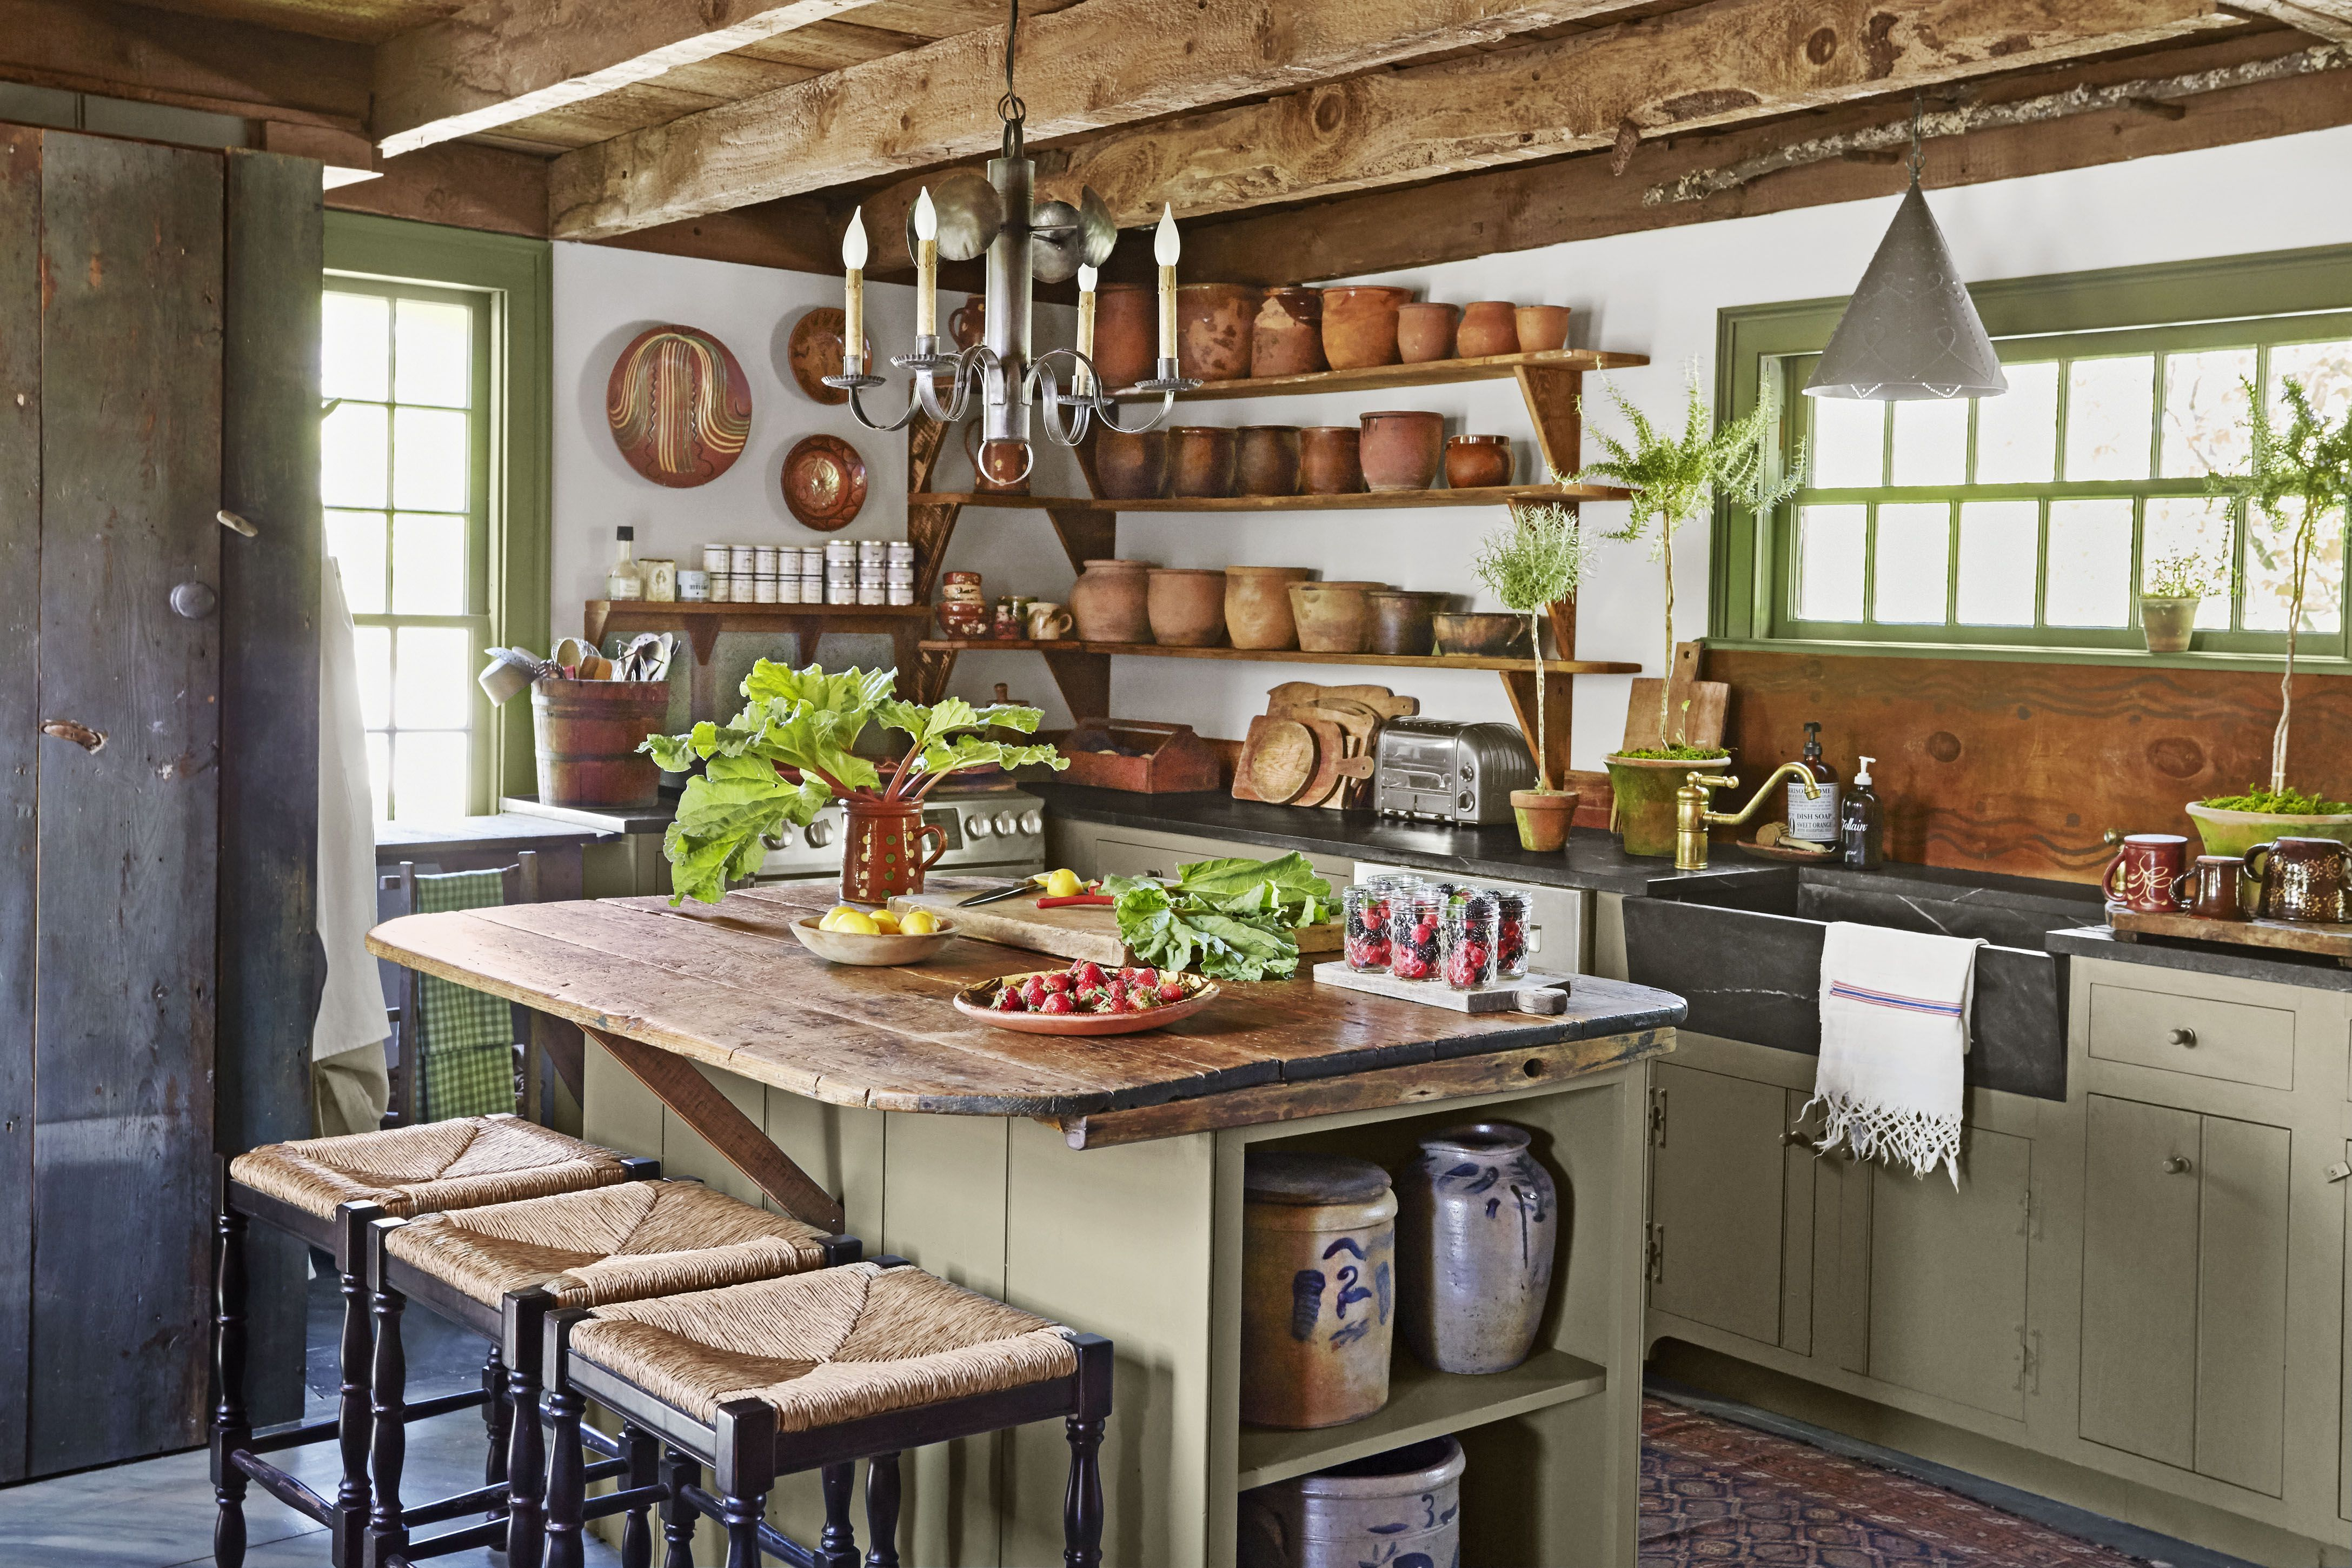 34 Farmhouse Style Kitchens - Rustic Decor Ideas for Kitchens on Farmhouse Rustic Kitchen Ideas  id=44424